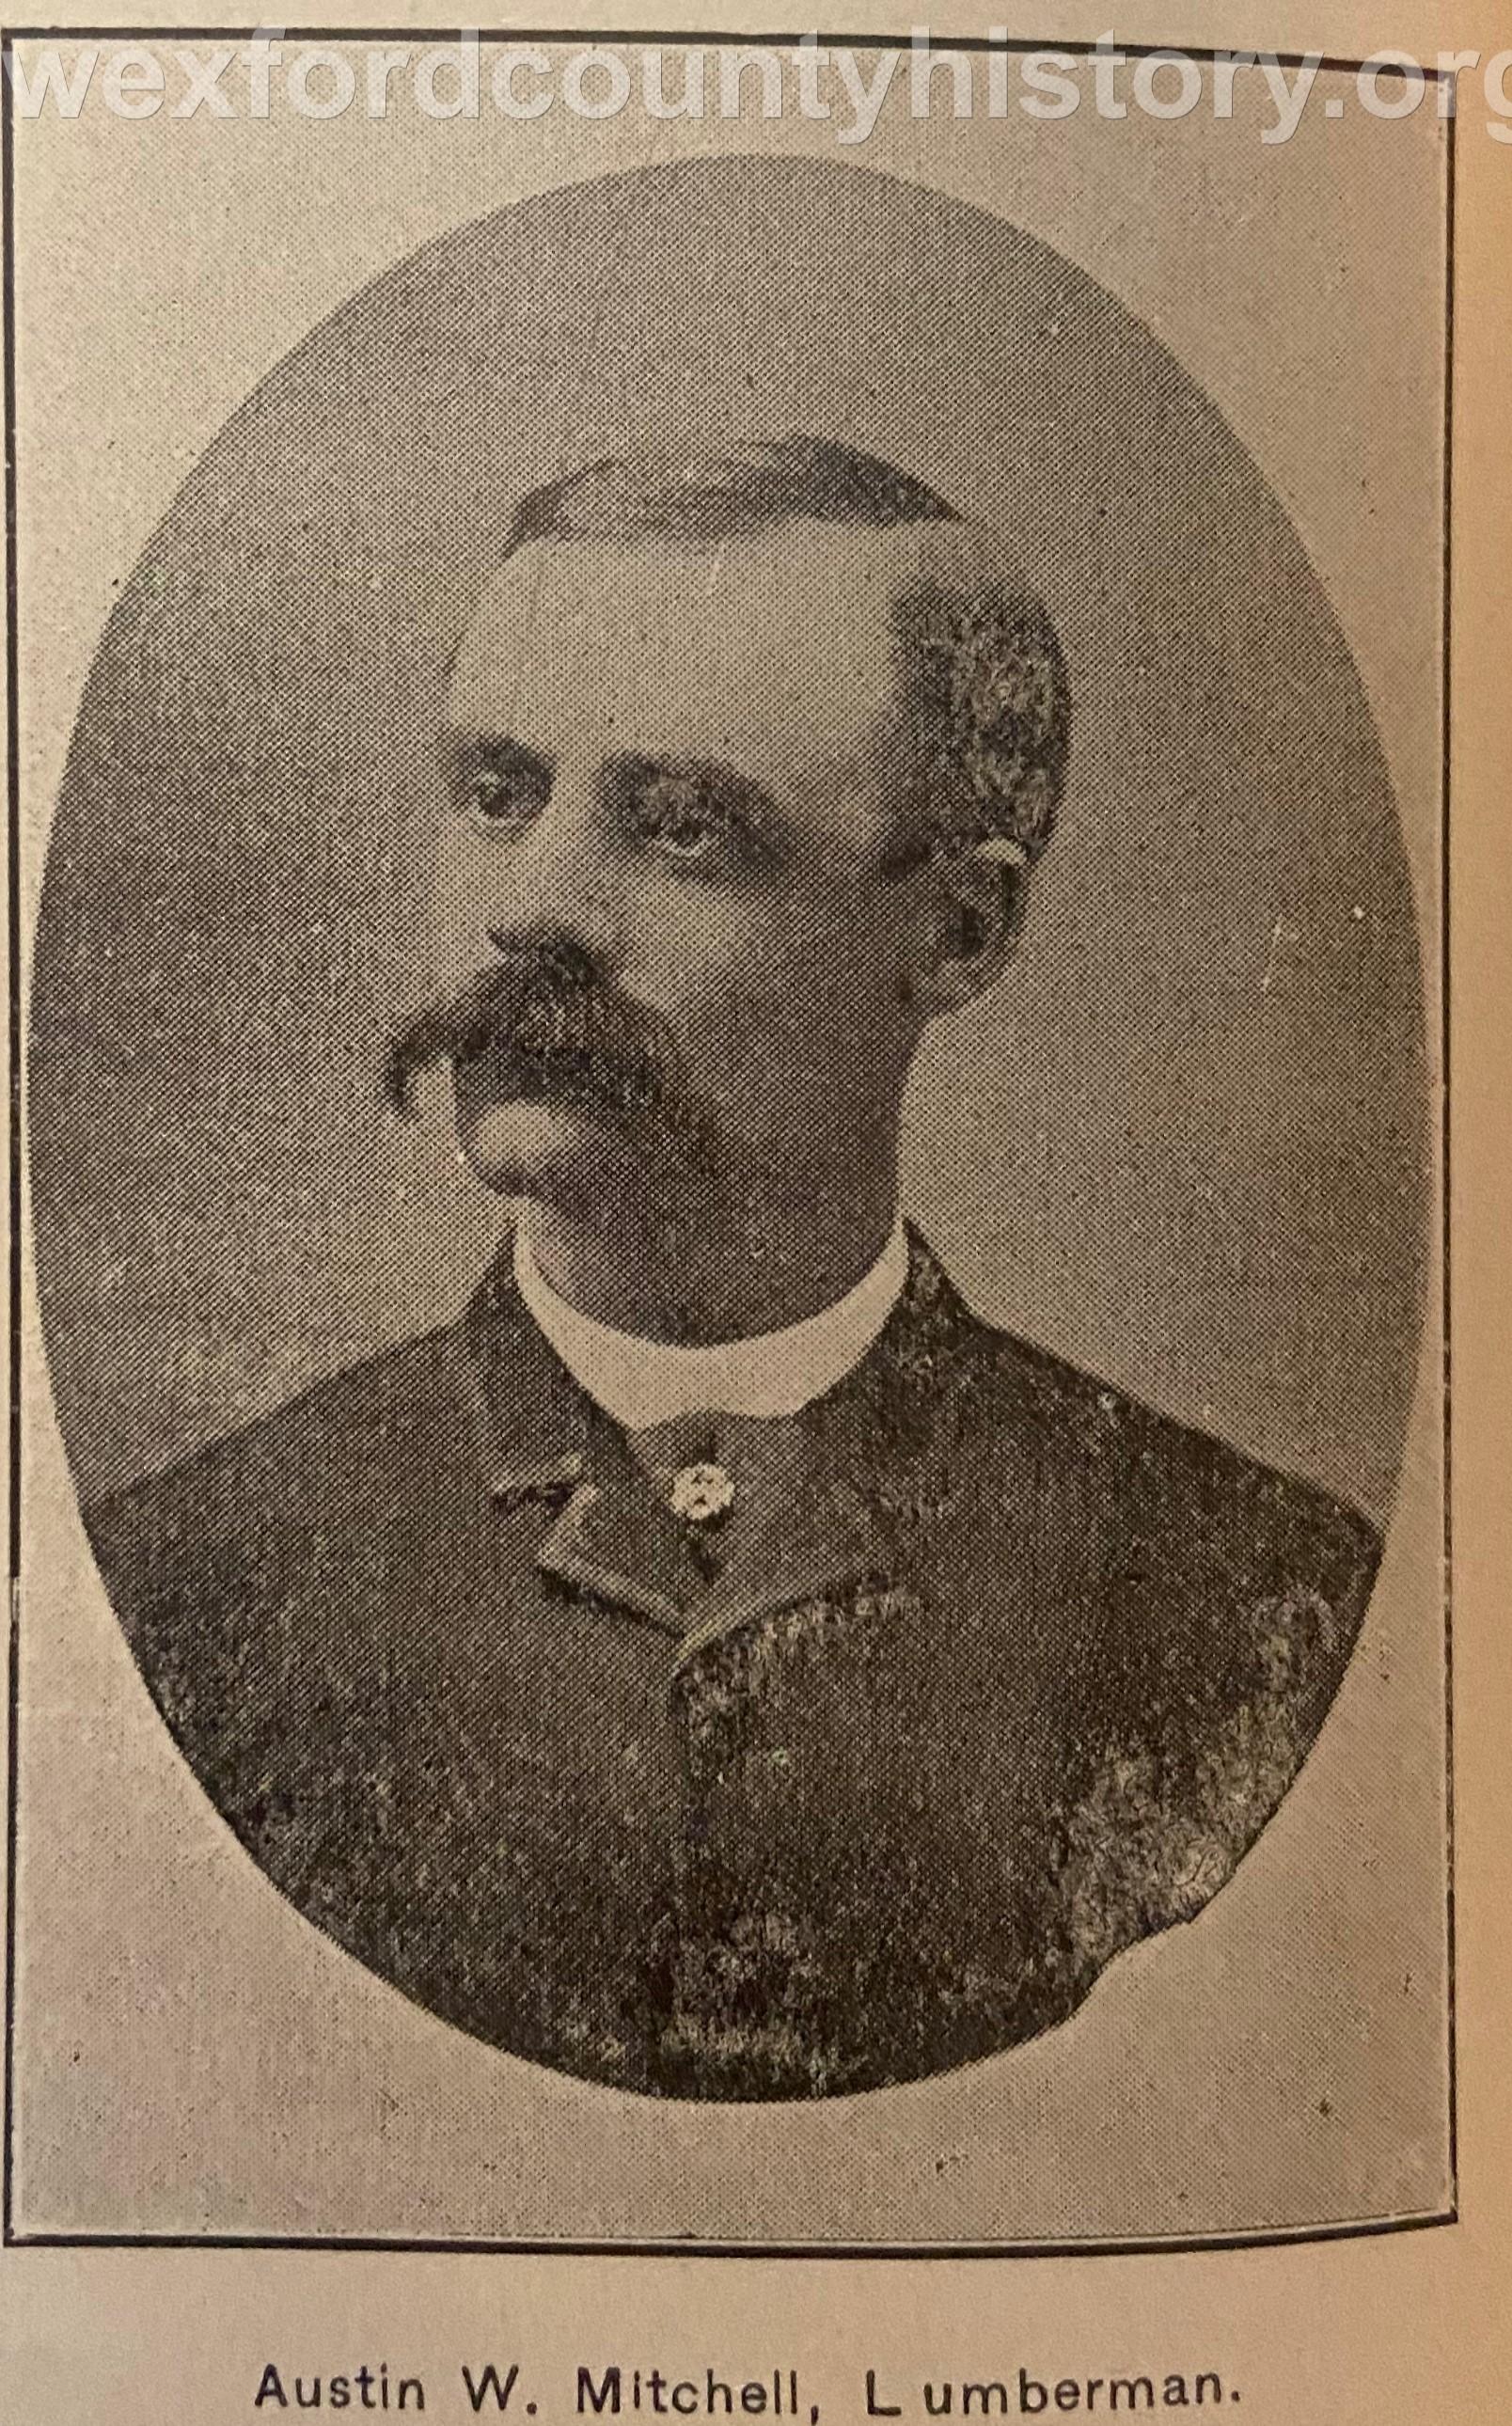 Austin W. Mitchell